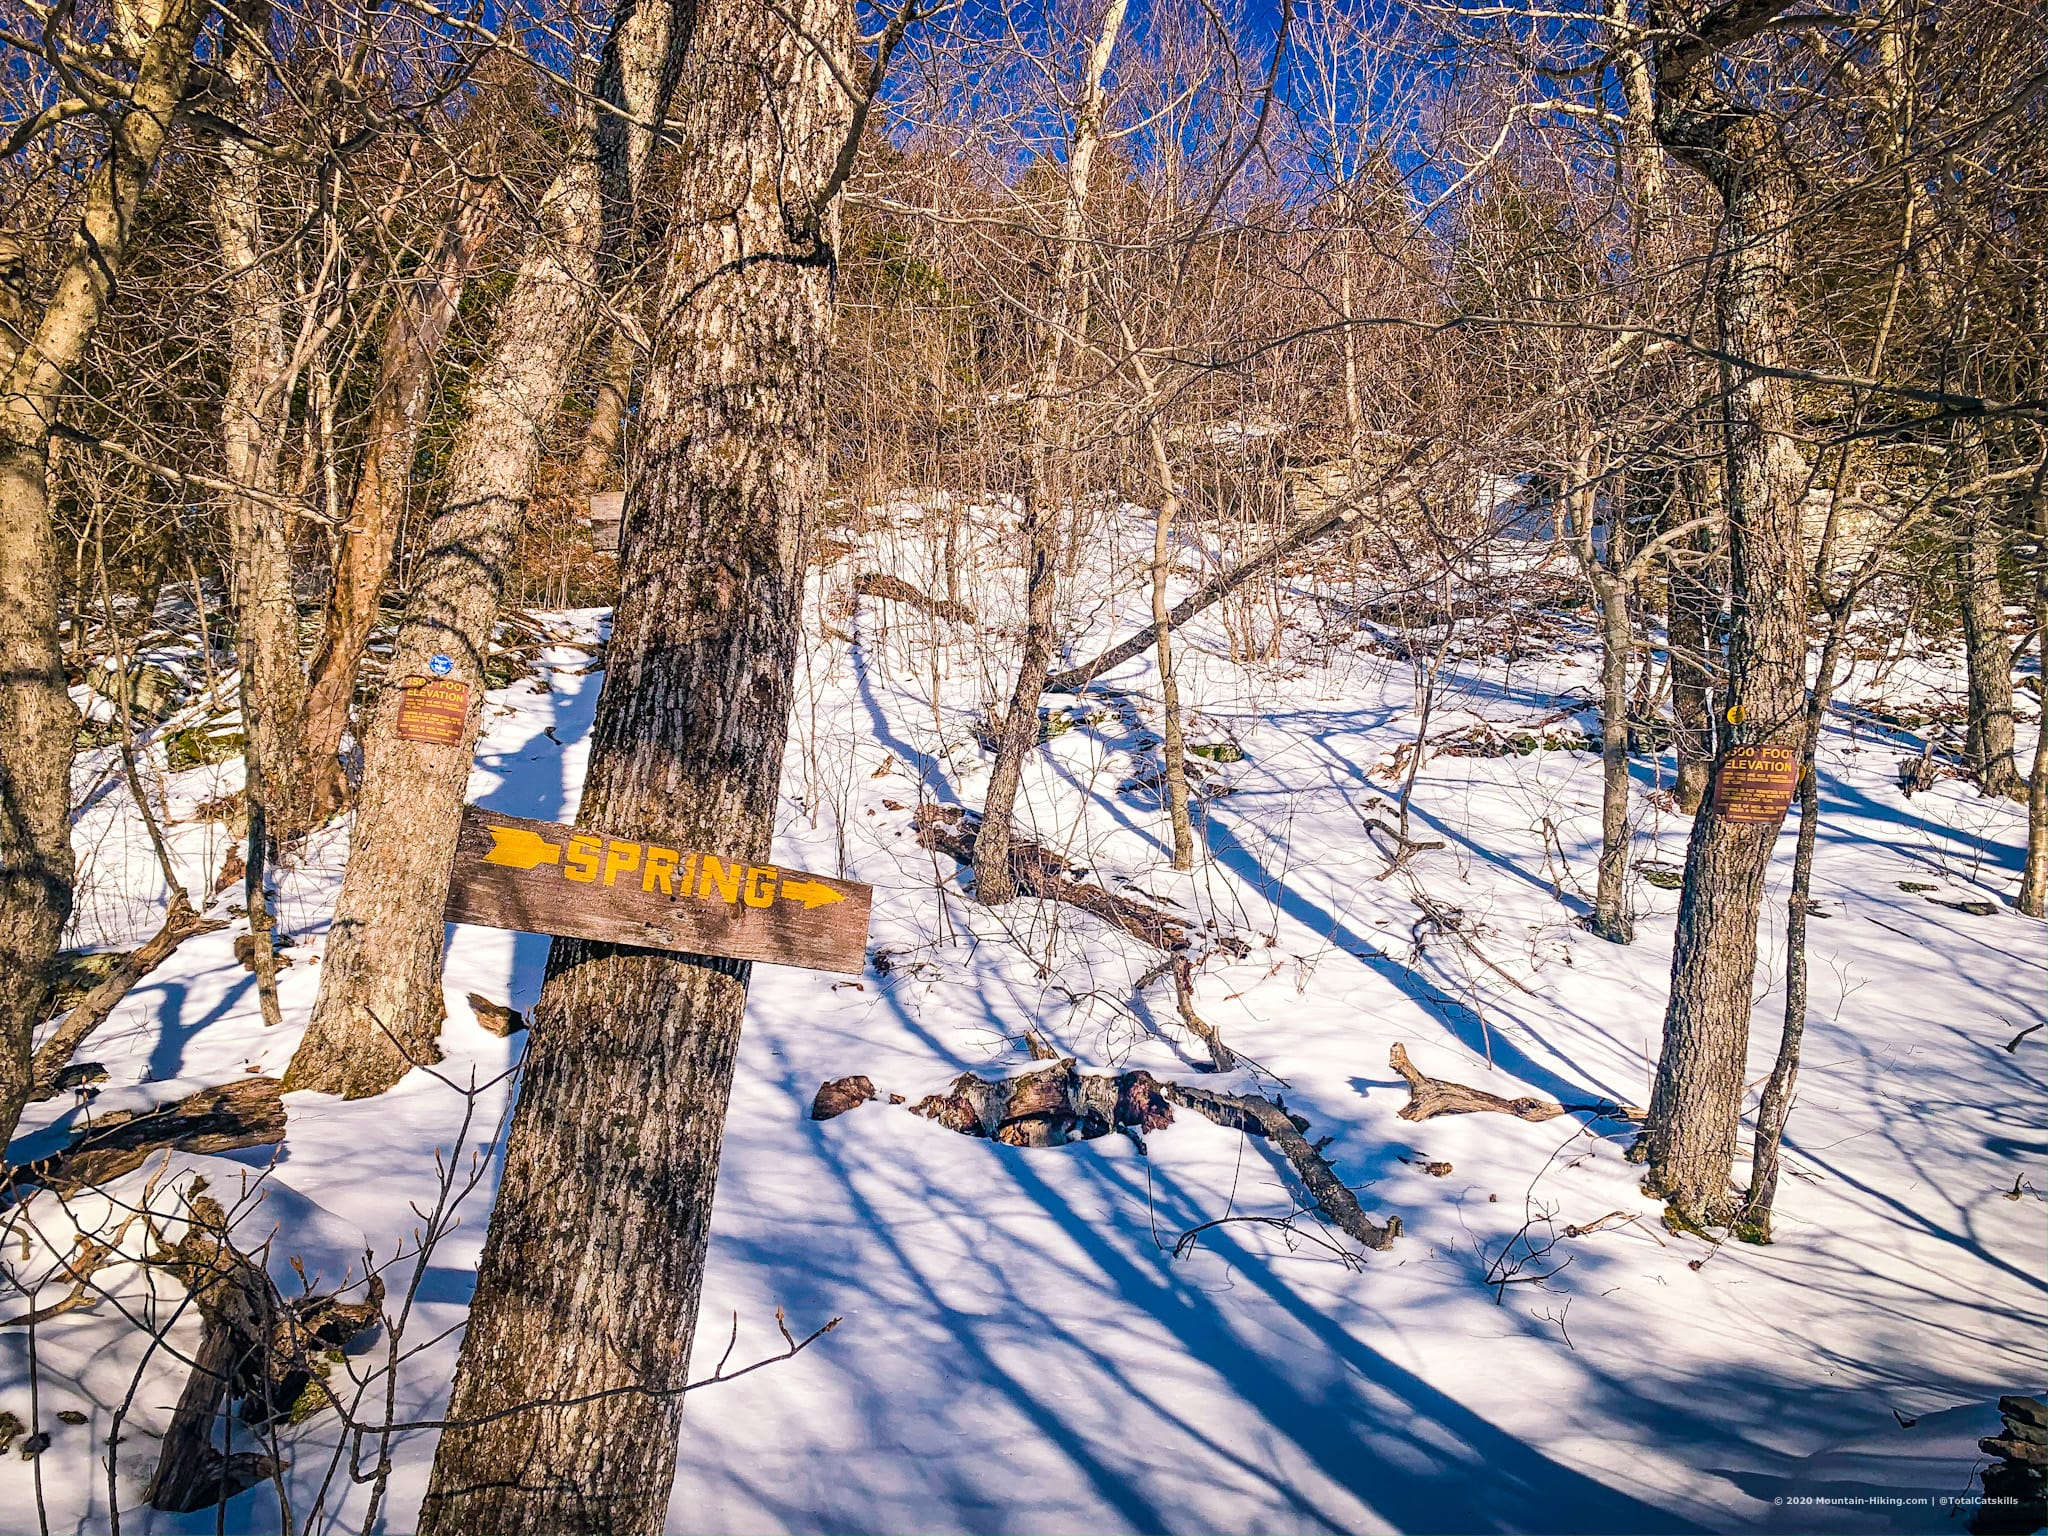 Signposts on Daley Ridge